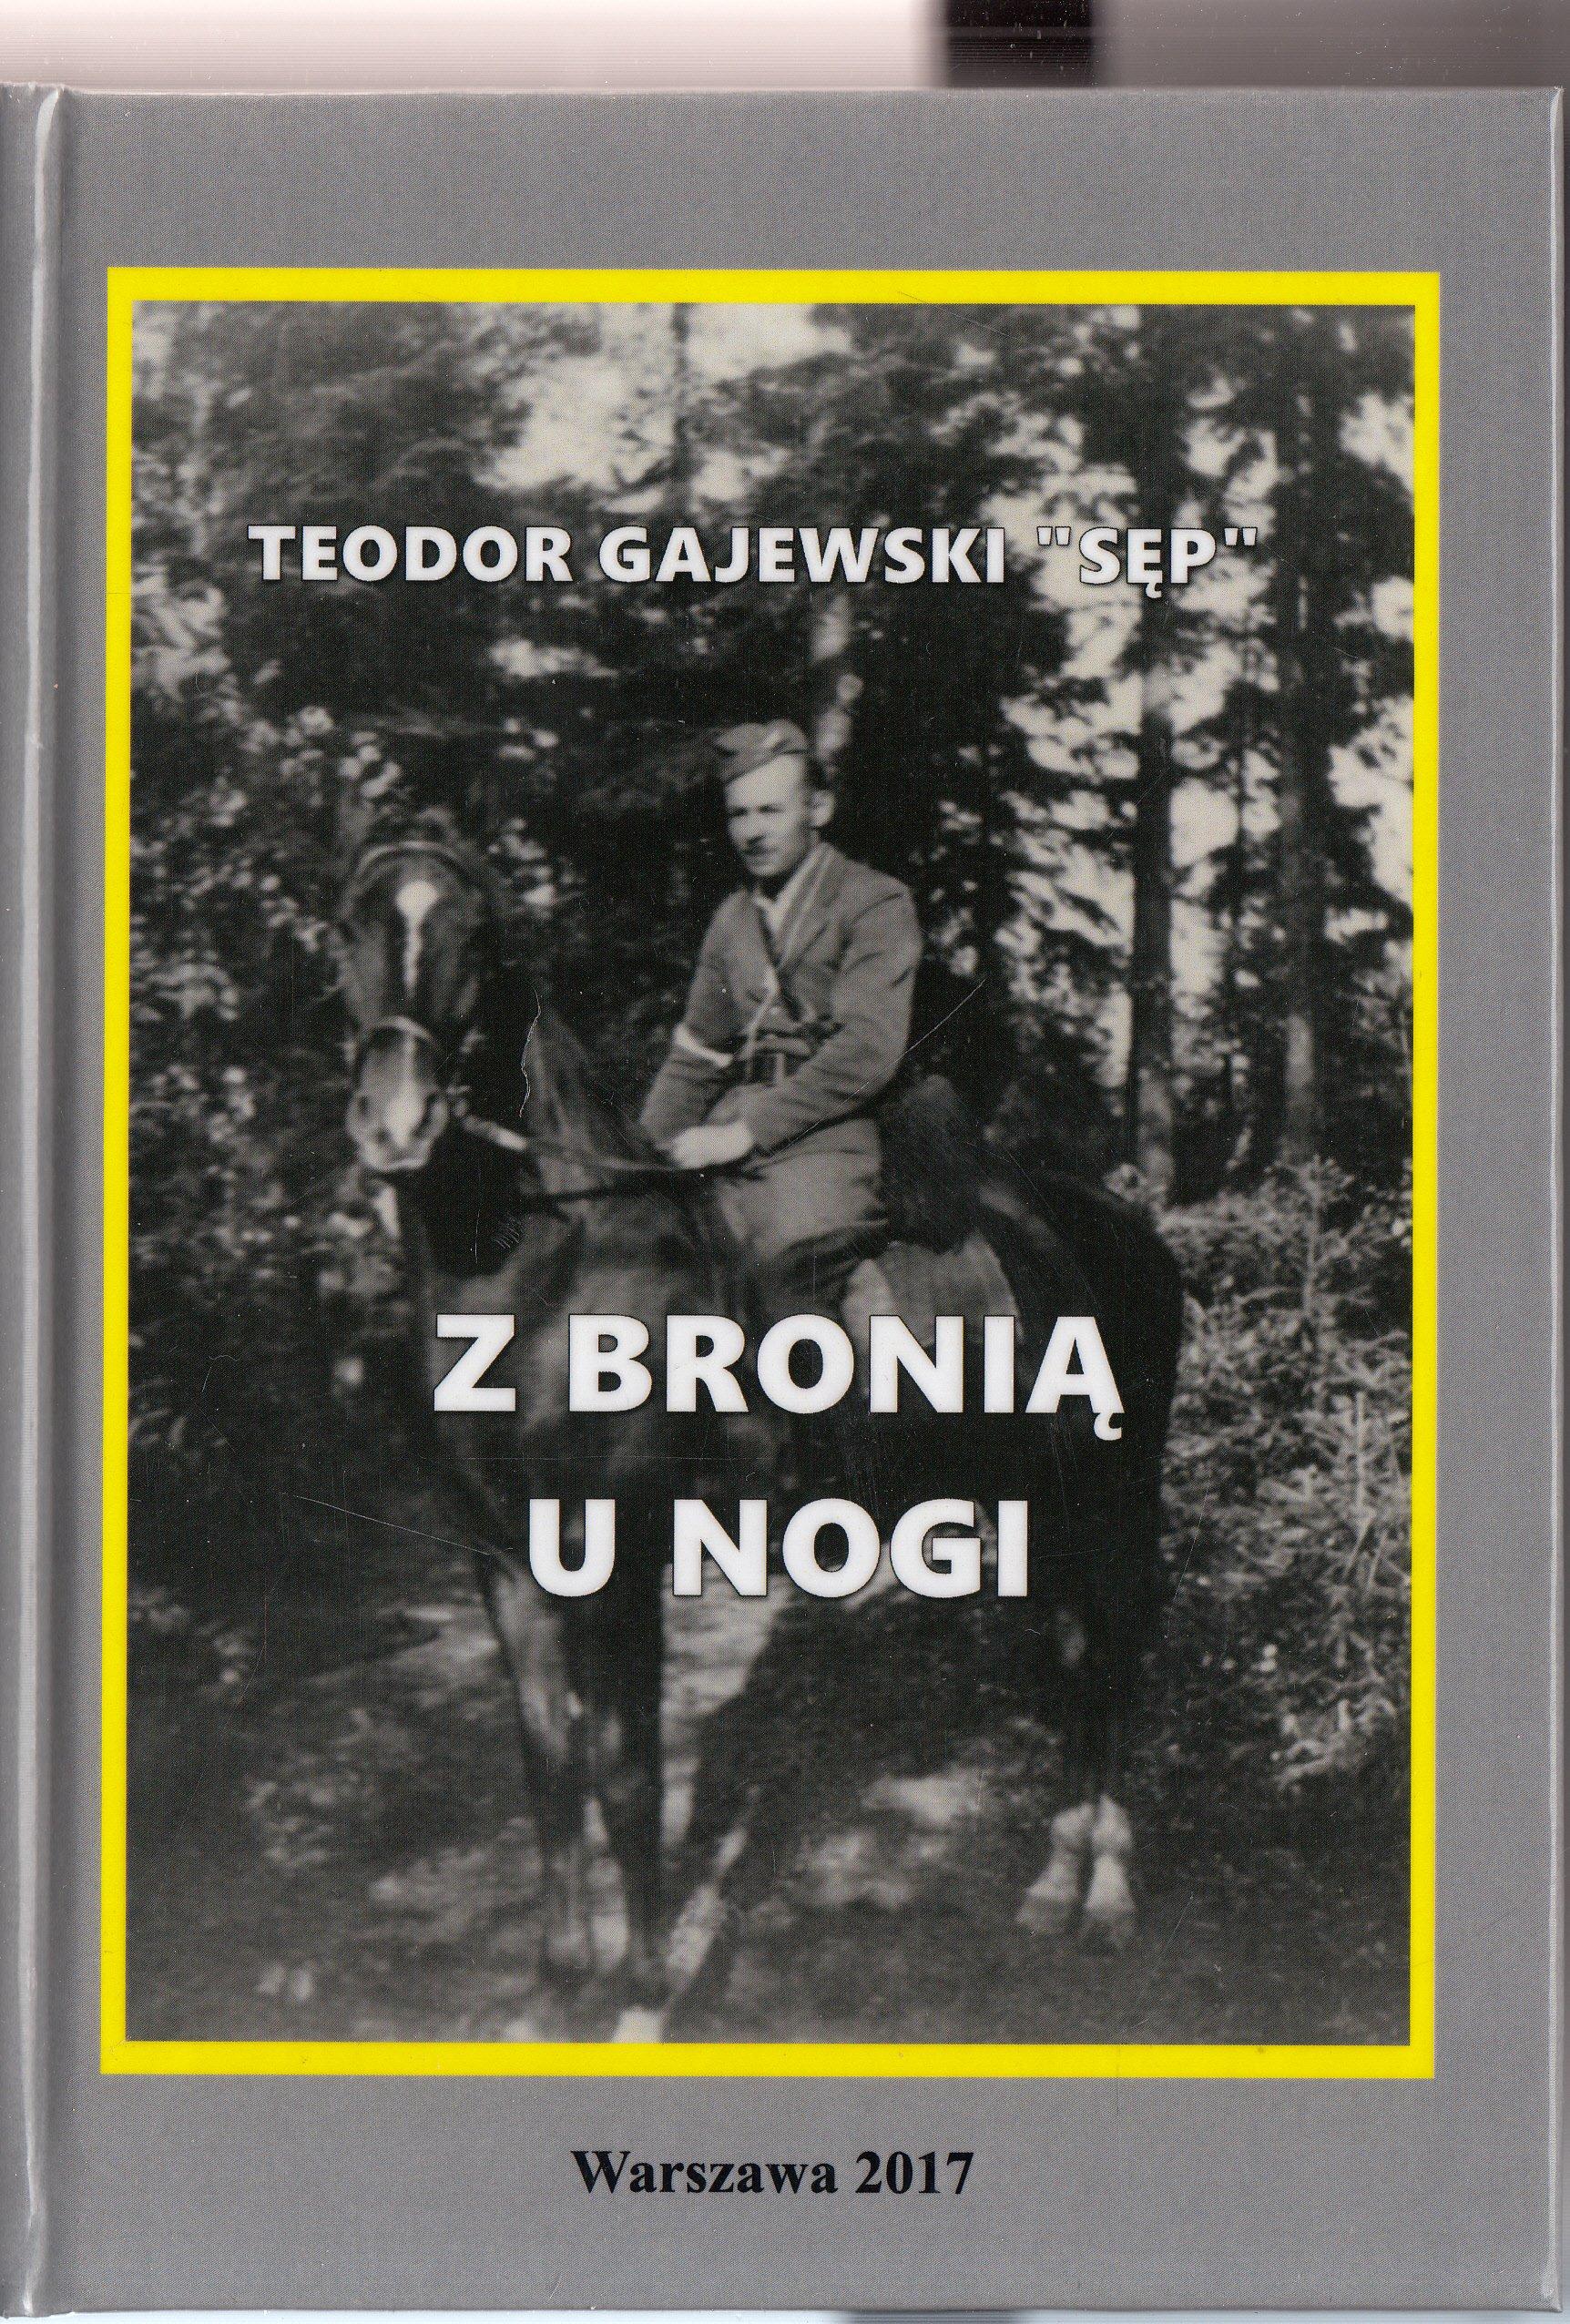 Z bronią u nogi AK Teodor Grajewski Sęp